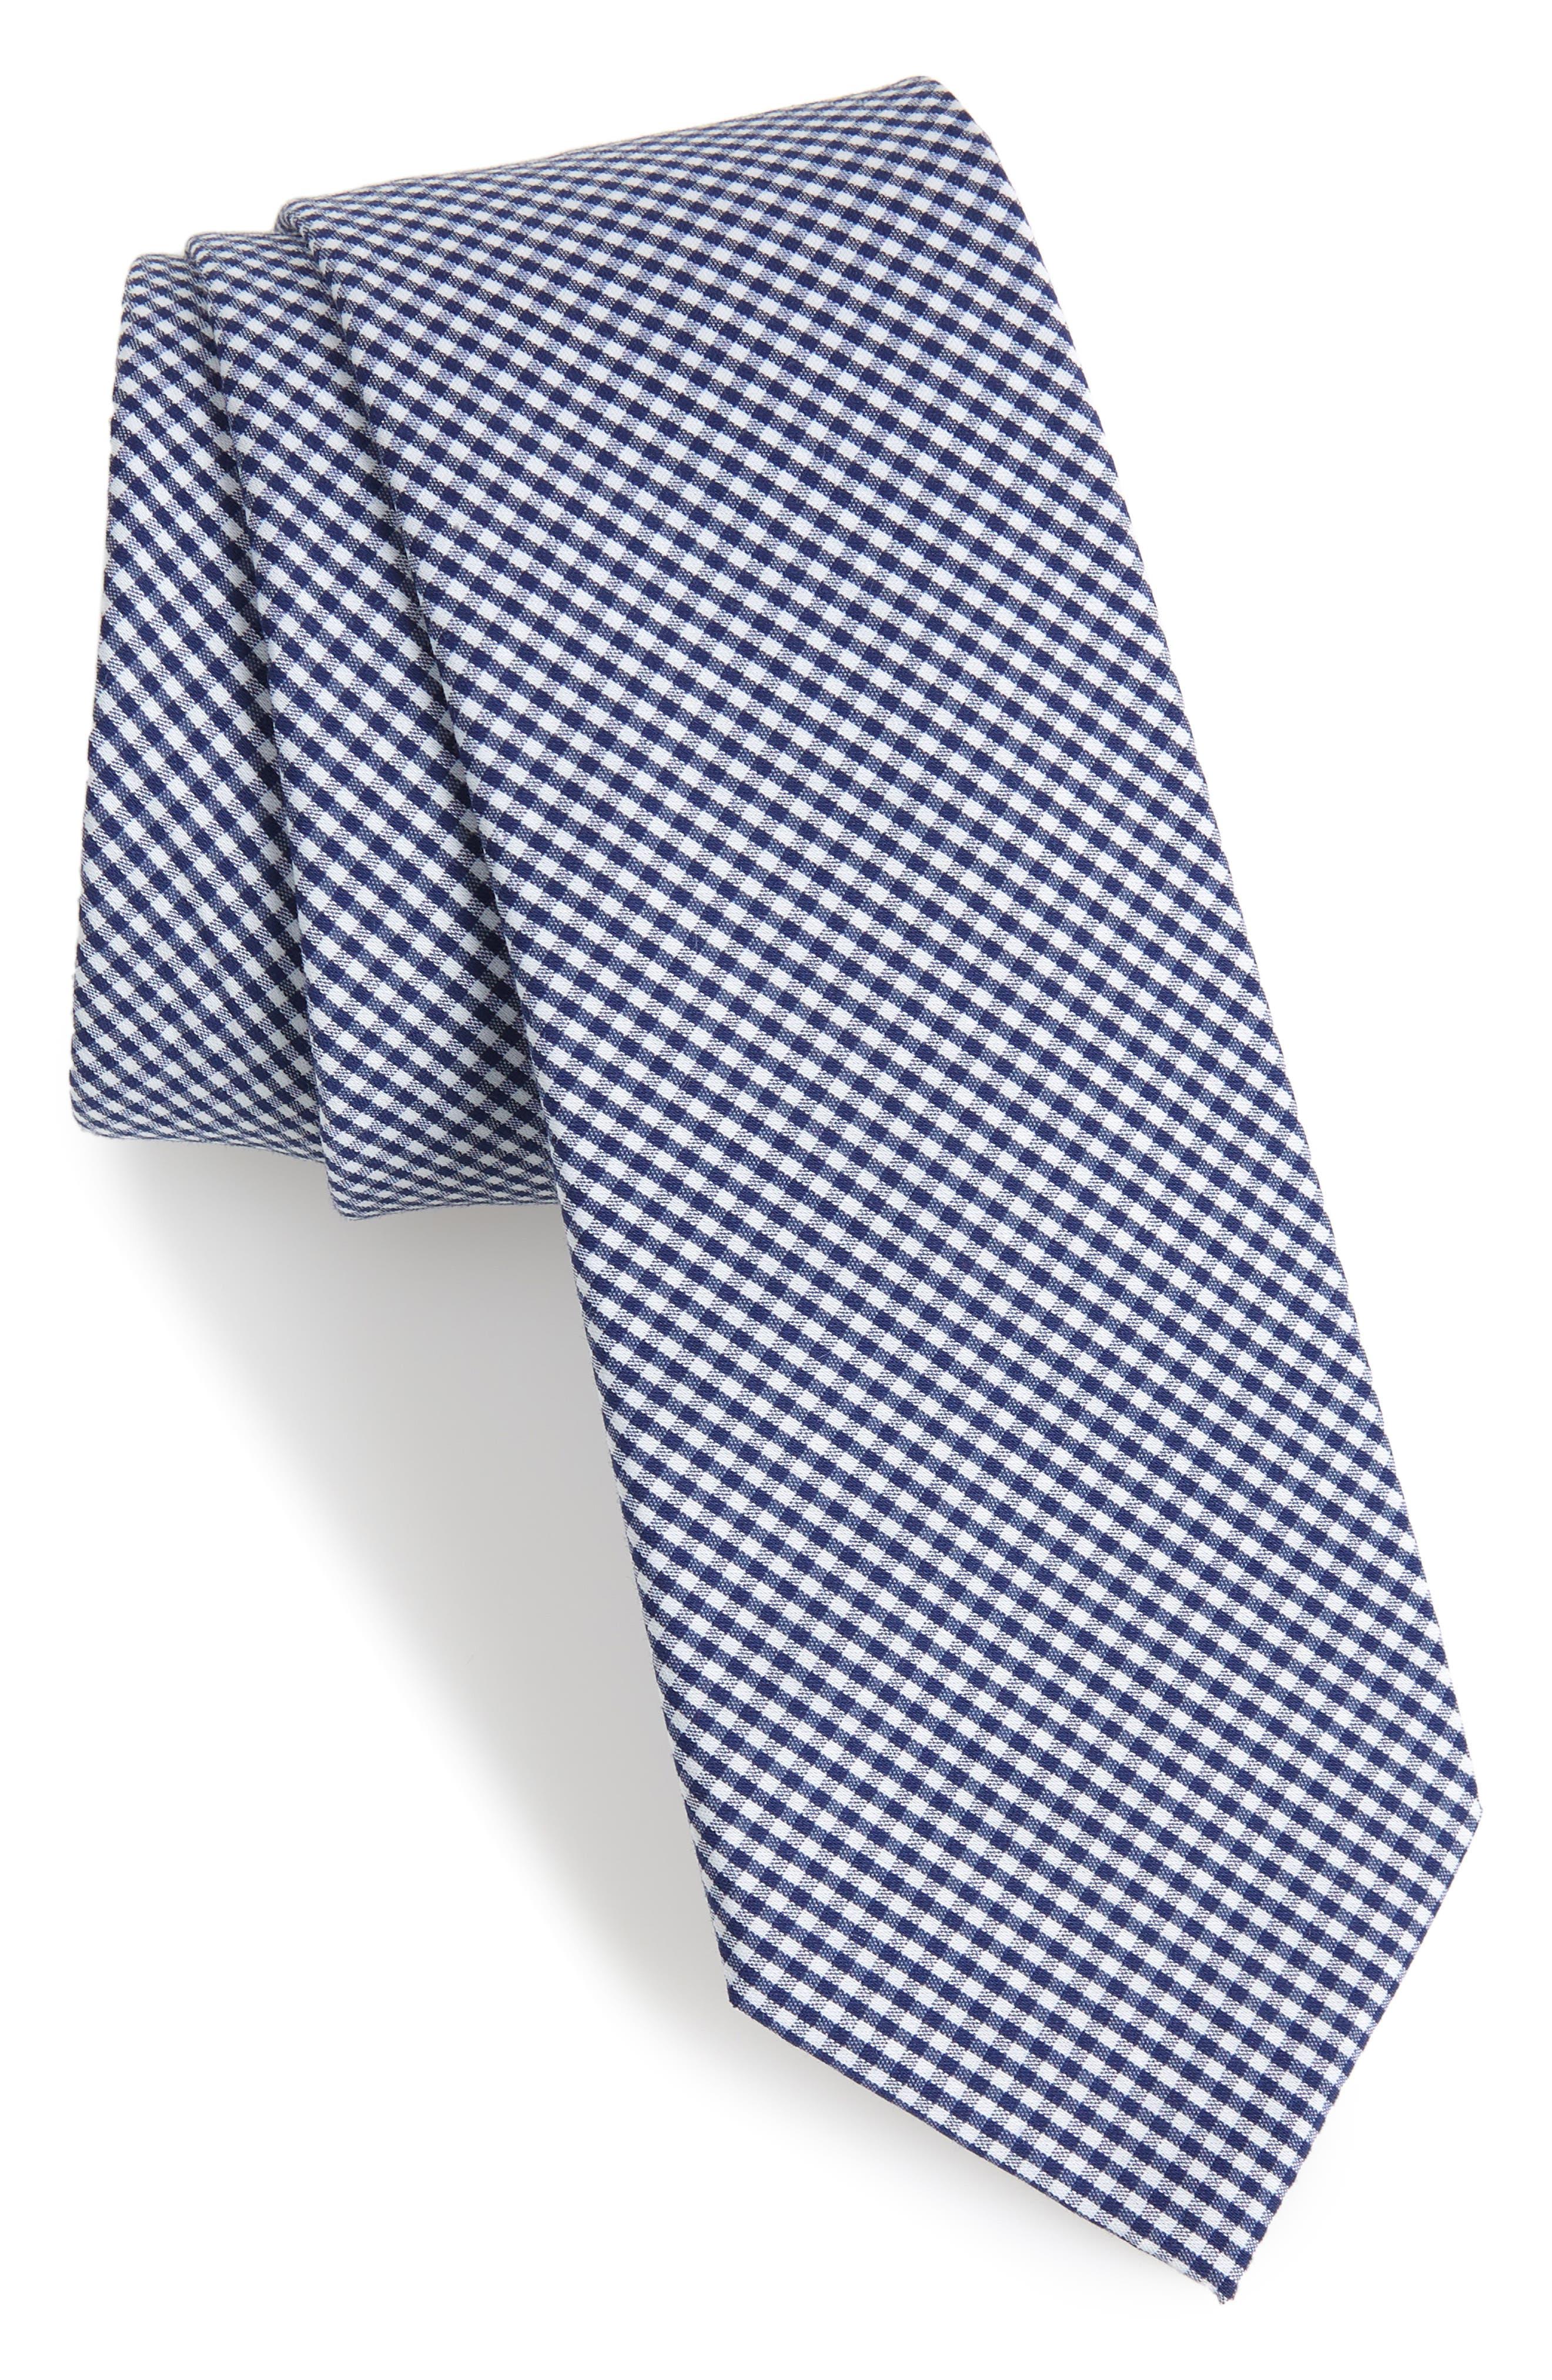 Sydney Check Cotton Skinny Tie,                             Main thumbnail 1, color,